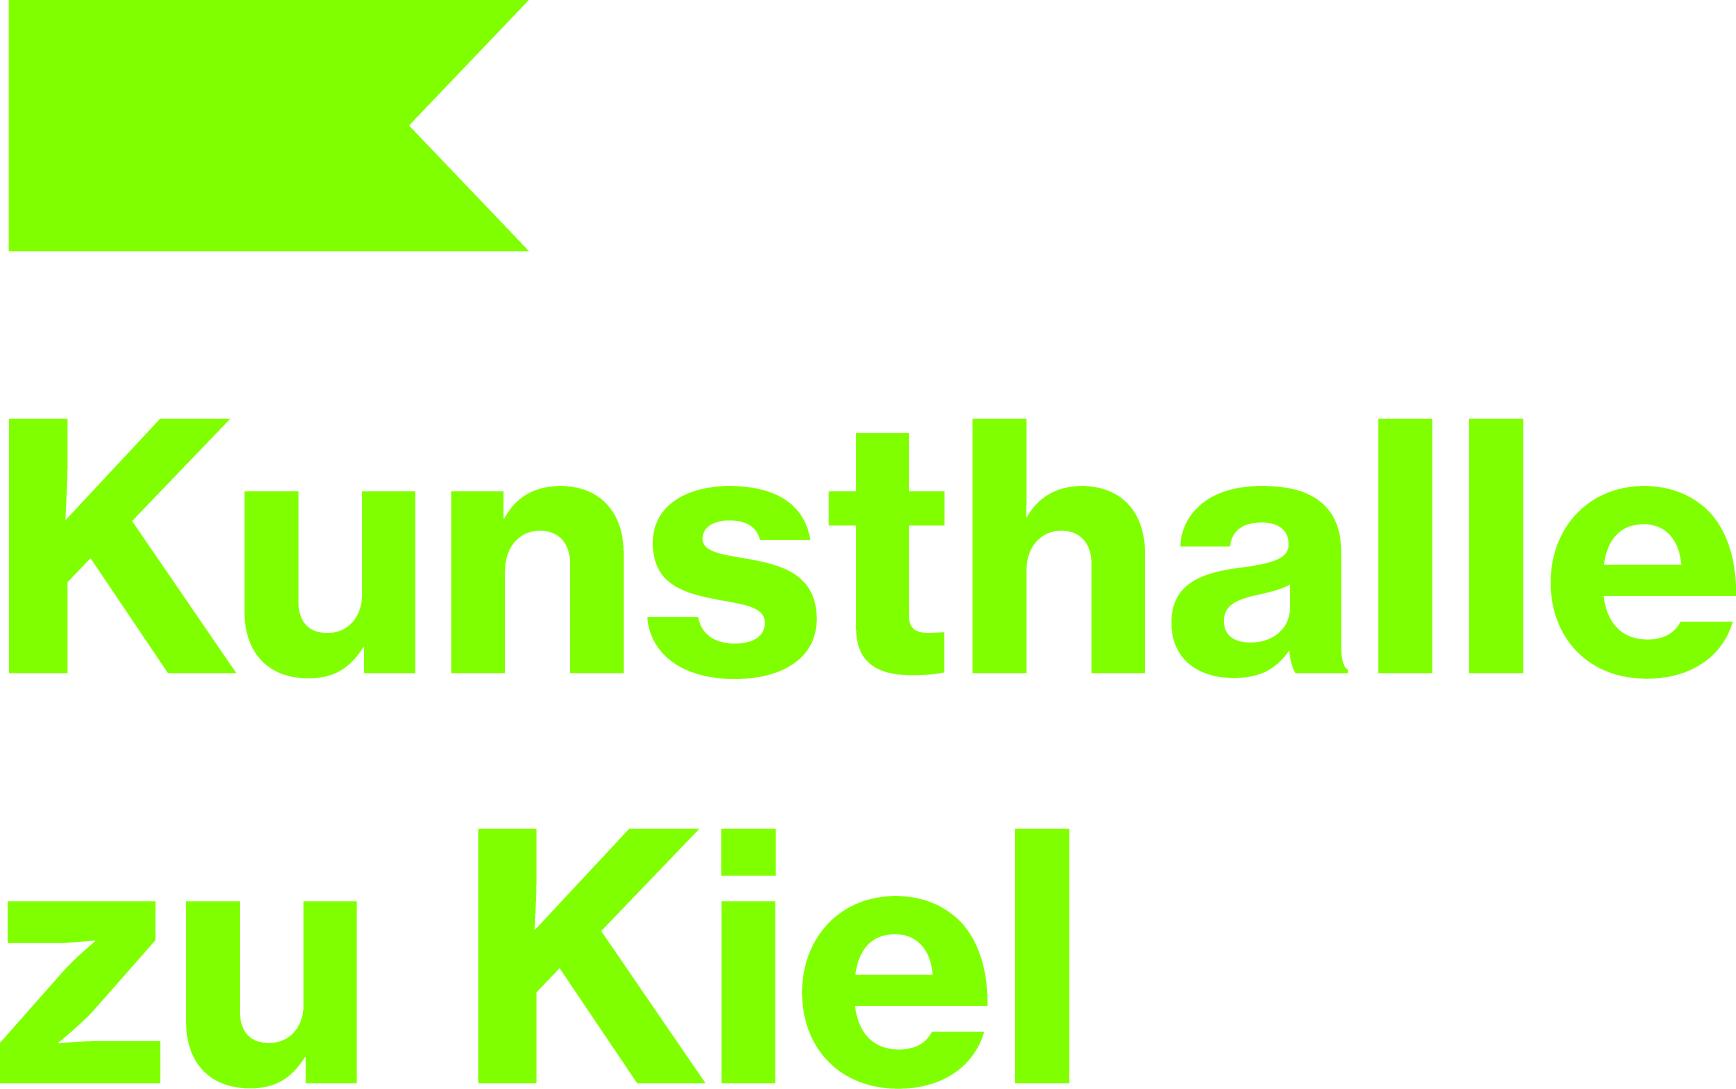 Kunsthalle_gruen.jpg